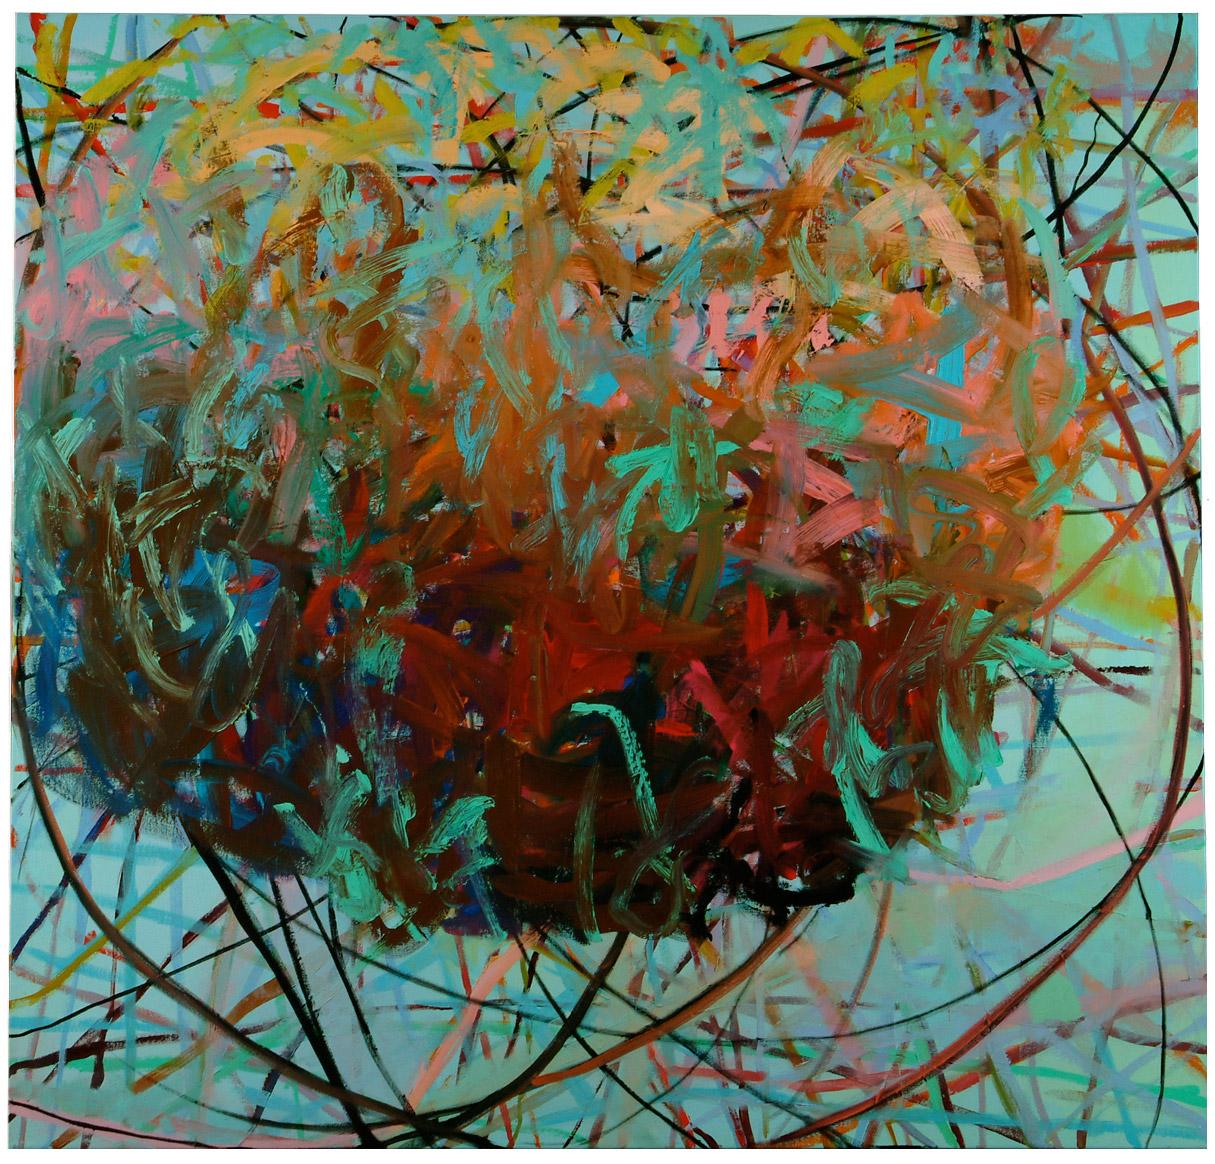 Shrub   48 × 50 inches 122 × 127 cm Oil on canvas 2005